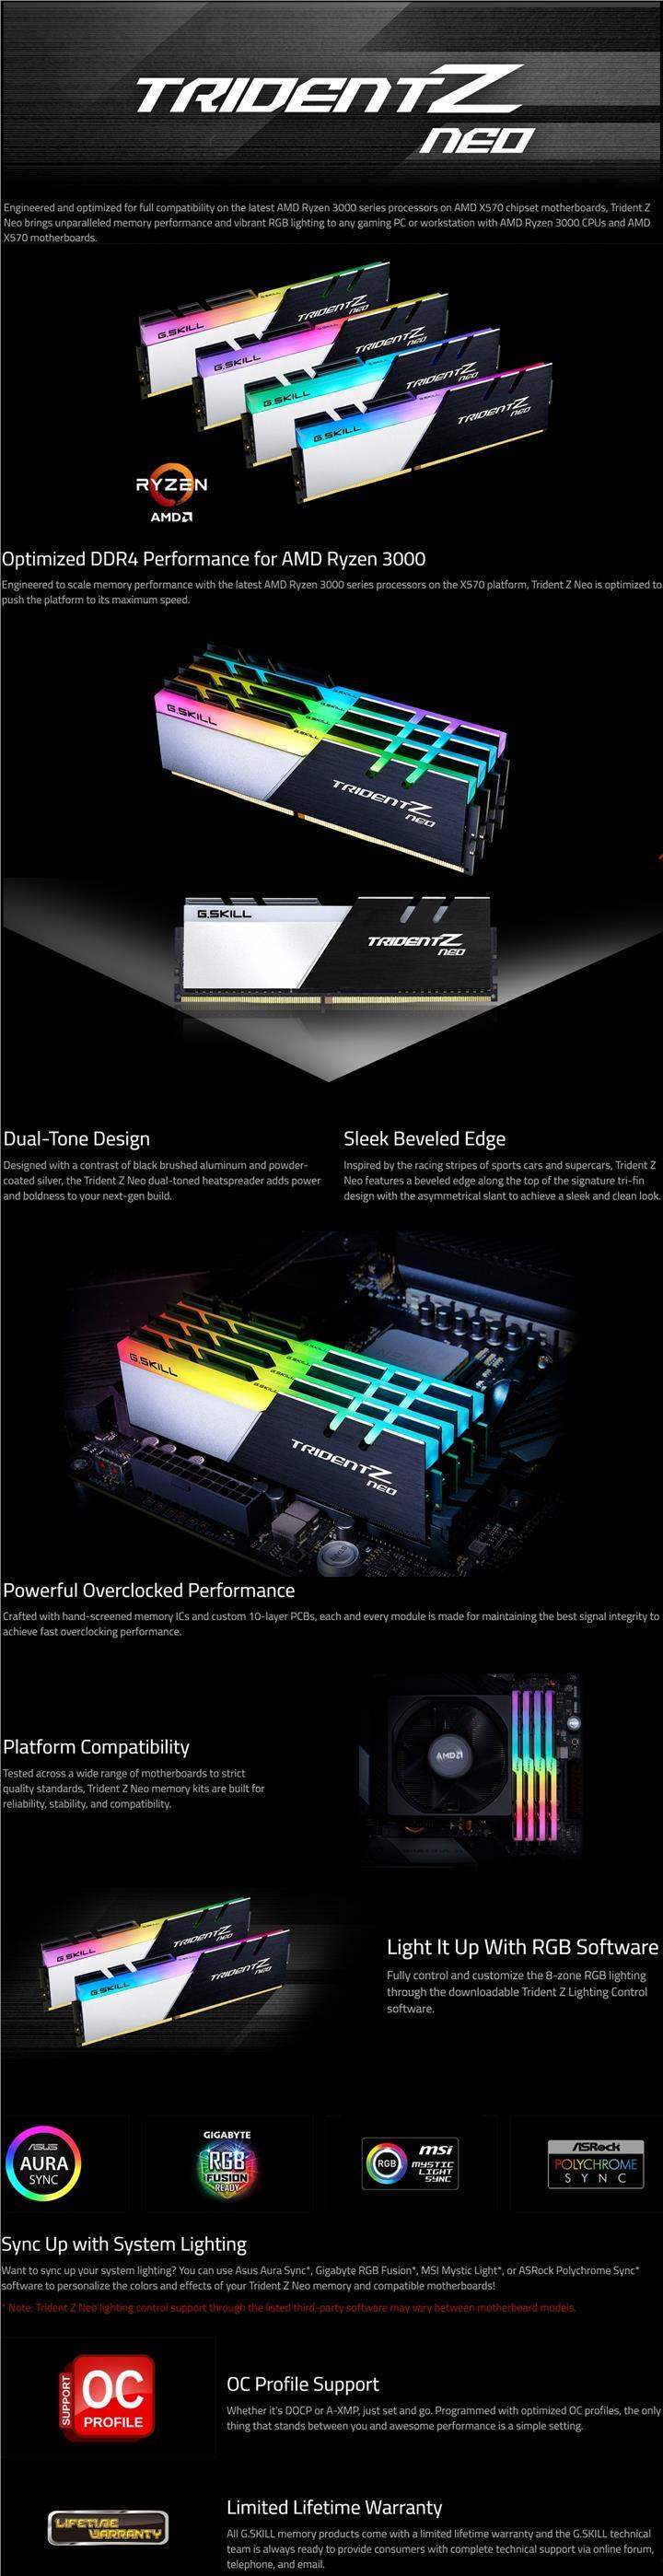 G SKILL TRIDENT Z NEO 16GB (2x8GB) DDR4 3600MHz CL18 RGB RAM